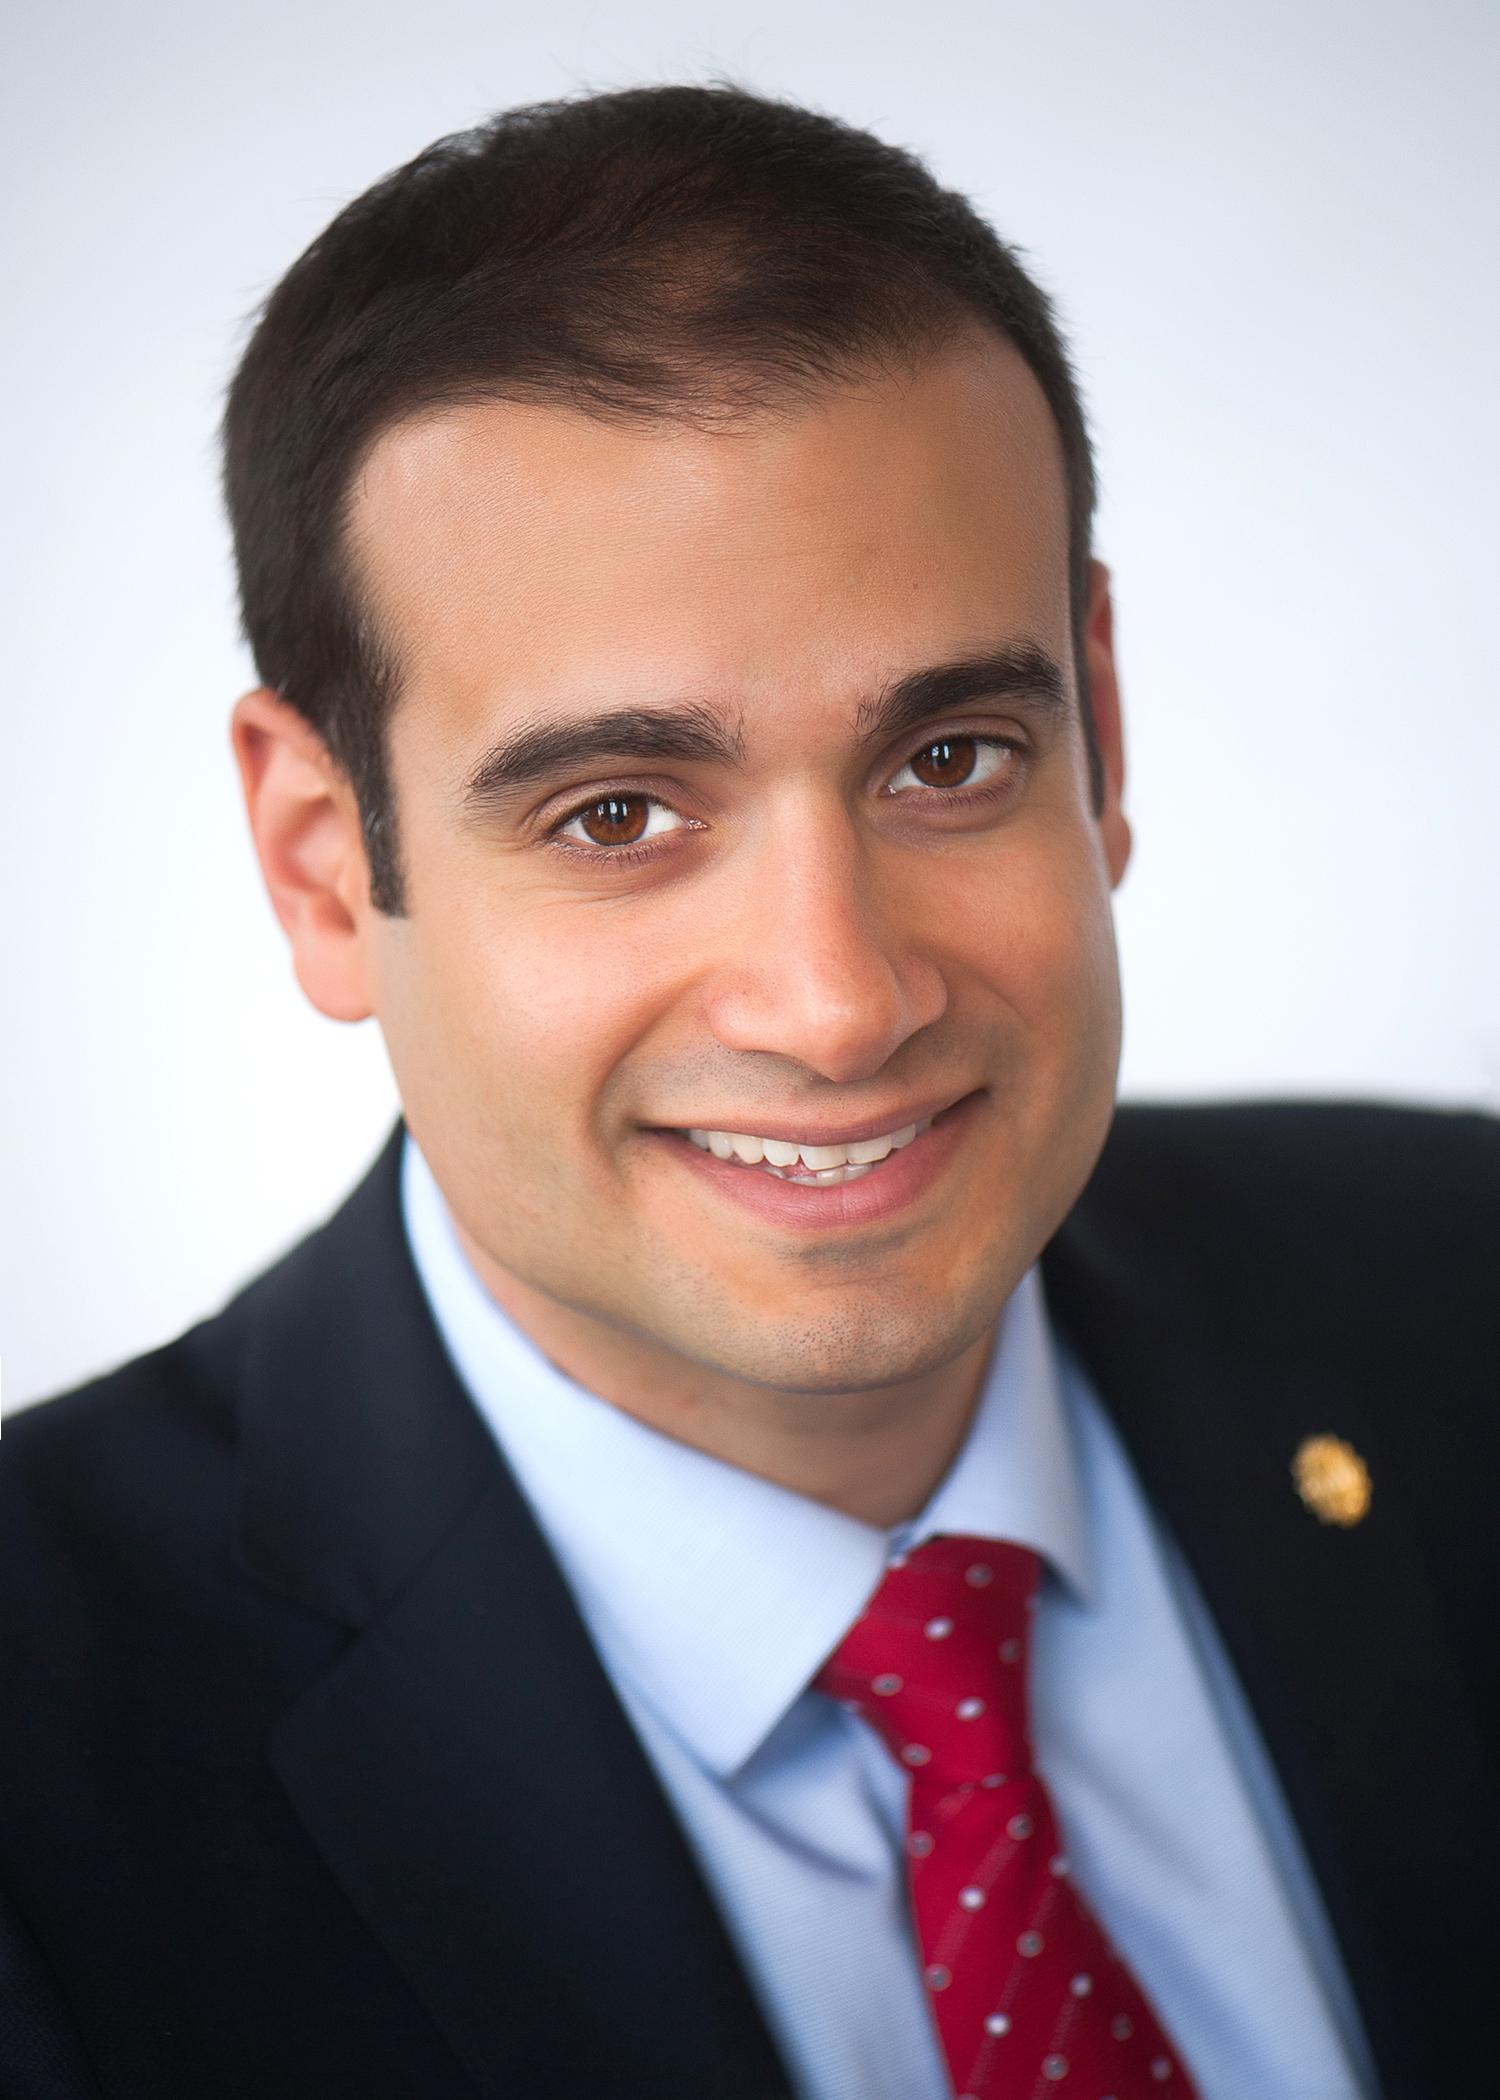 Municipal Affairs Minister Zach Churchill. (Photo from The Nova Scotia Legislature website)